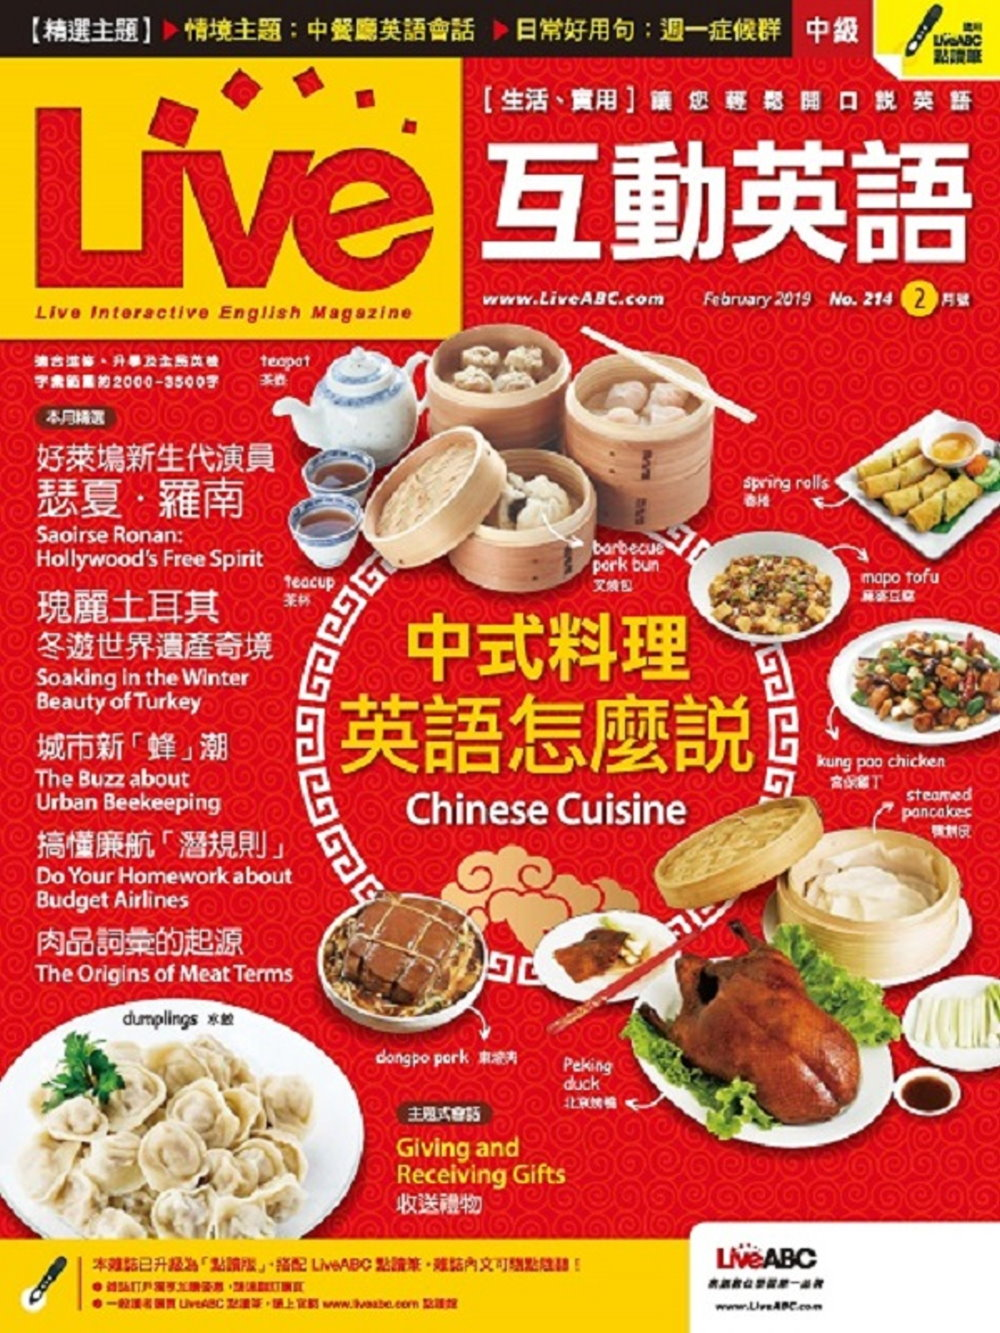 Live互動英語(互動光碟版)一年12期+3期+STEP BY STEP 生活英語圖解王